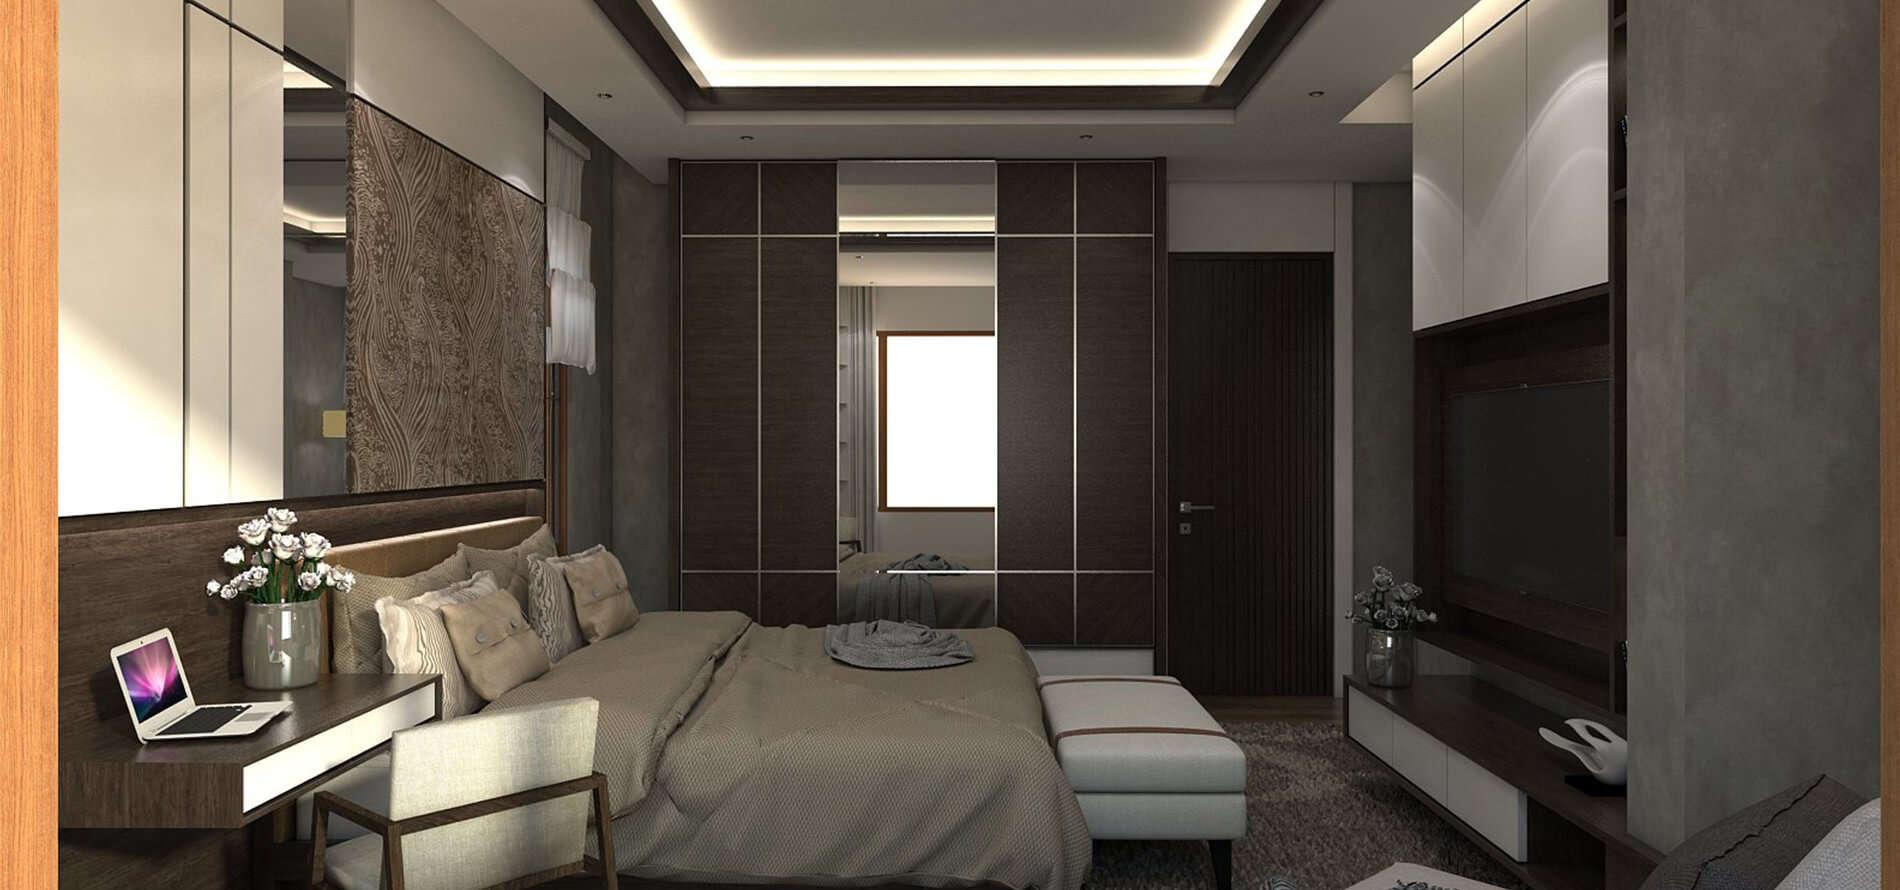 Anmol Builders Interiors